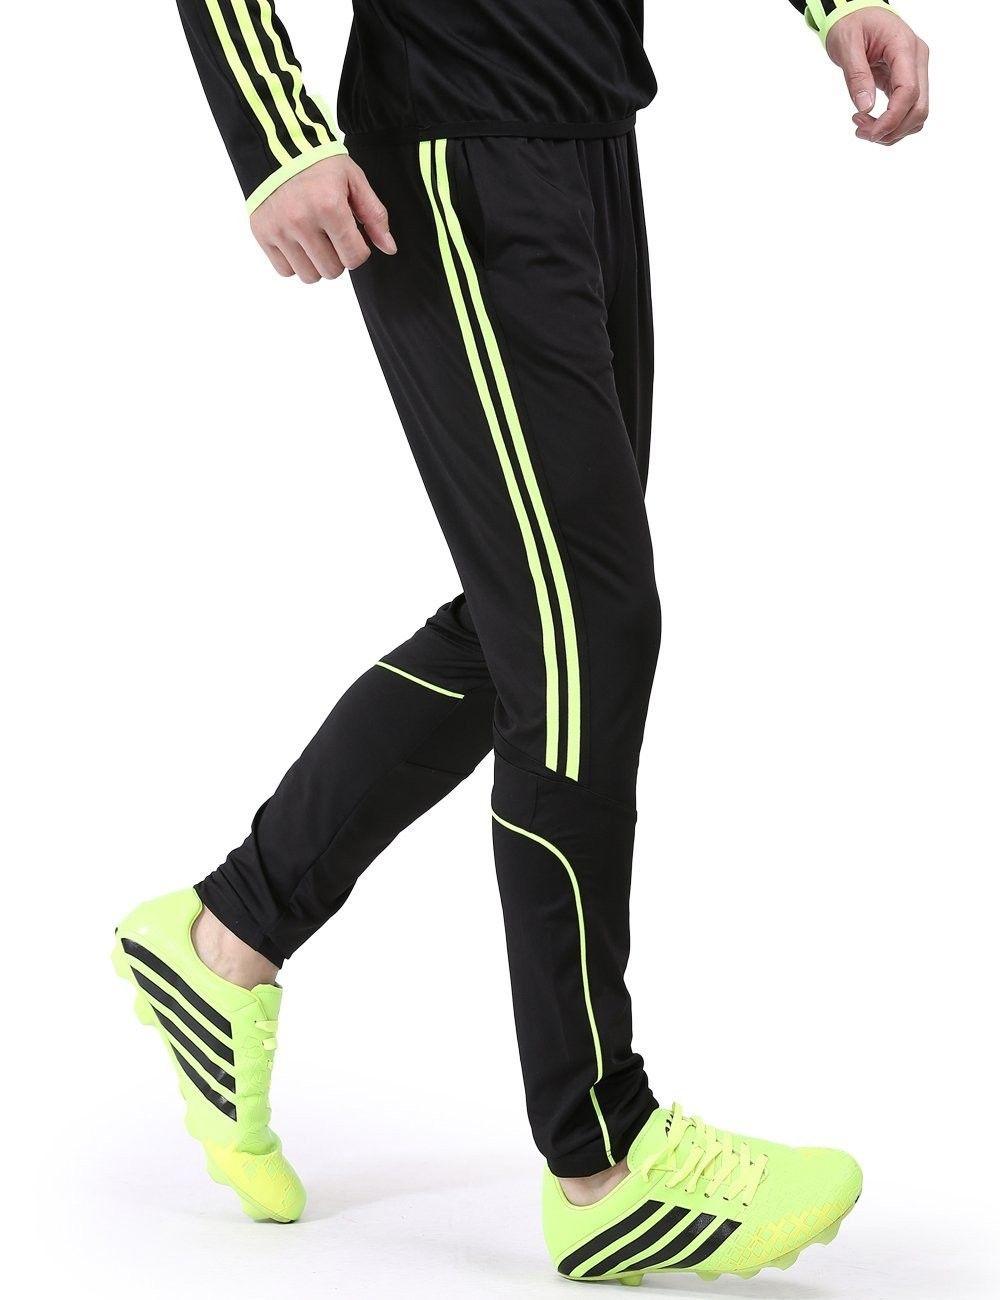 Soccer Athletic Training Pants Pants0002 Green M Green